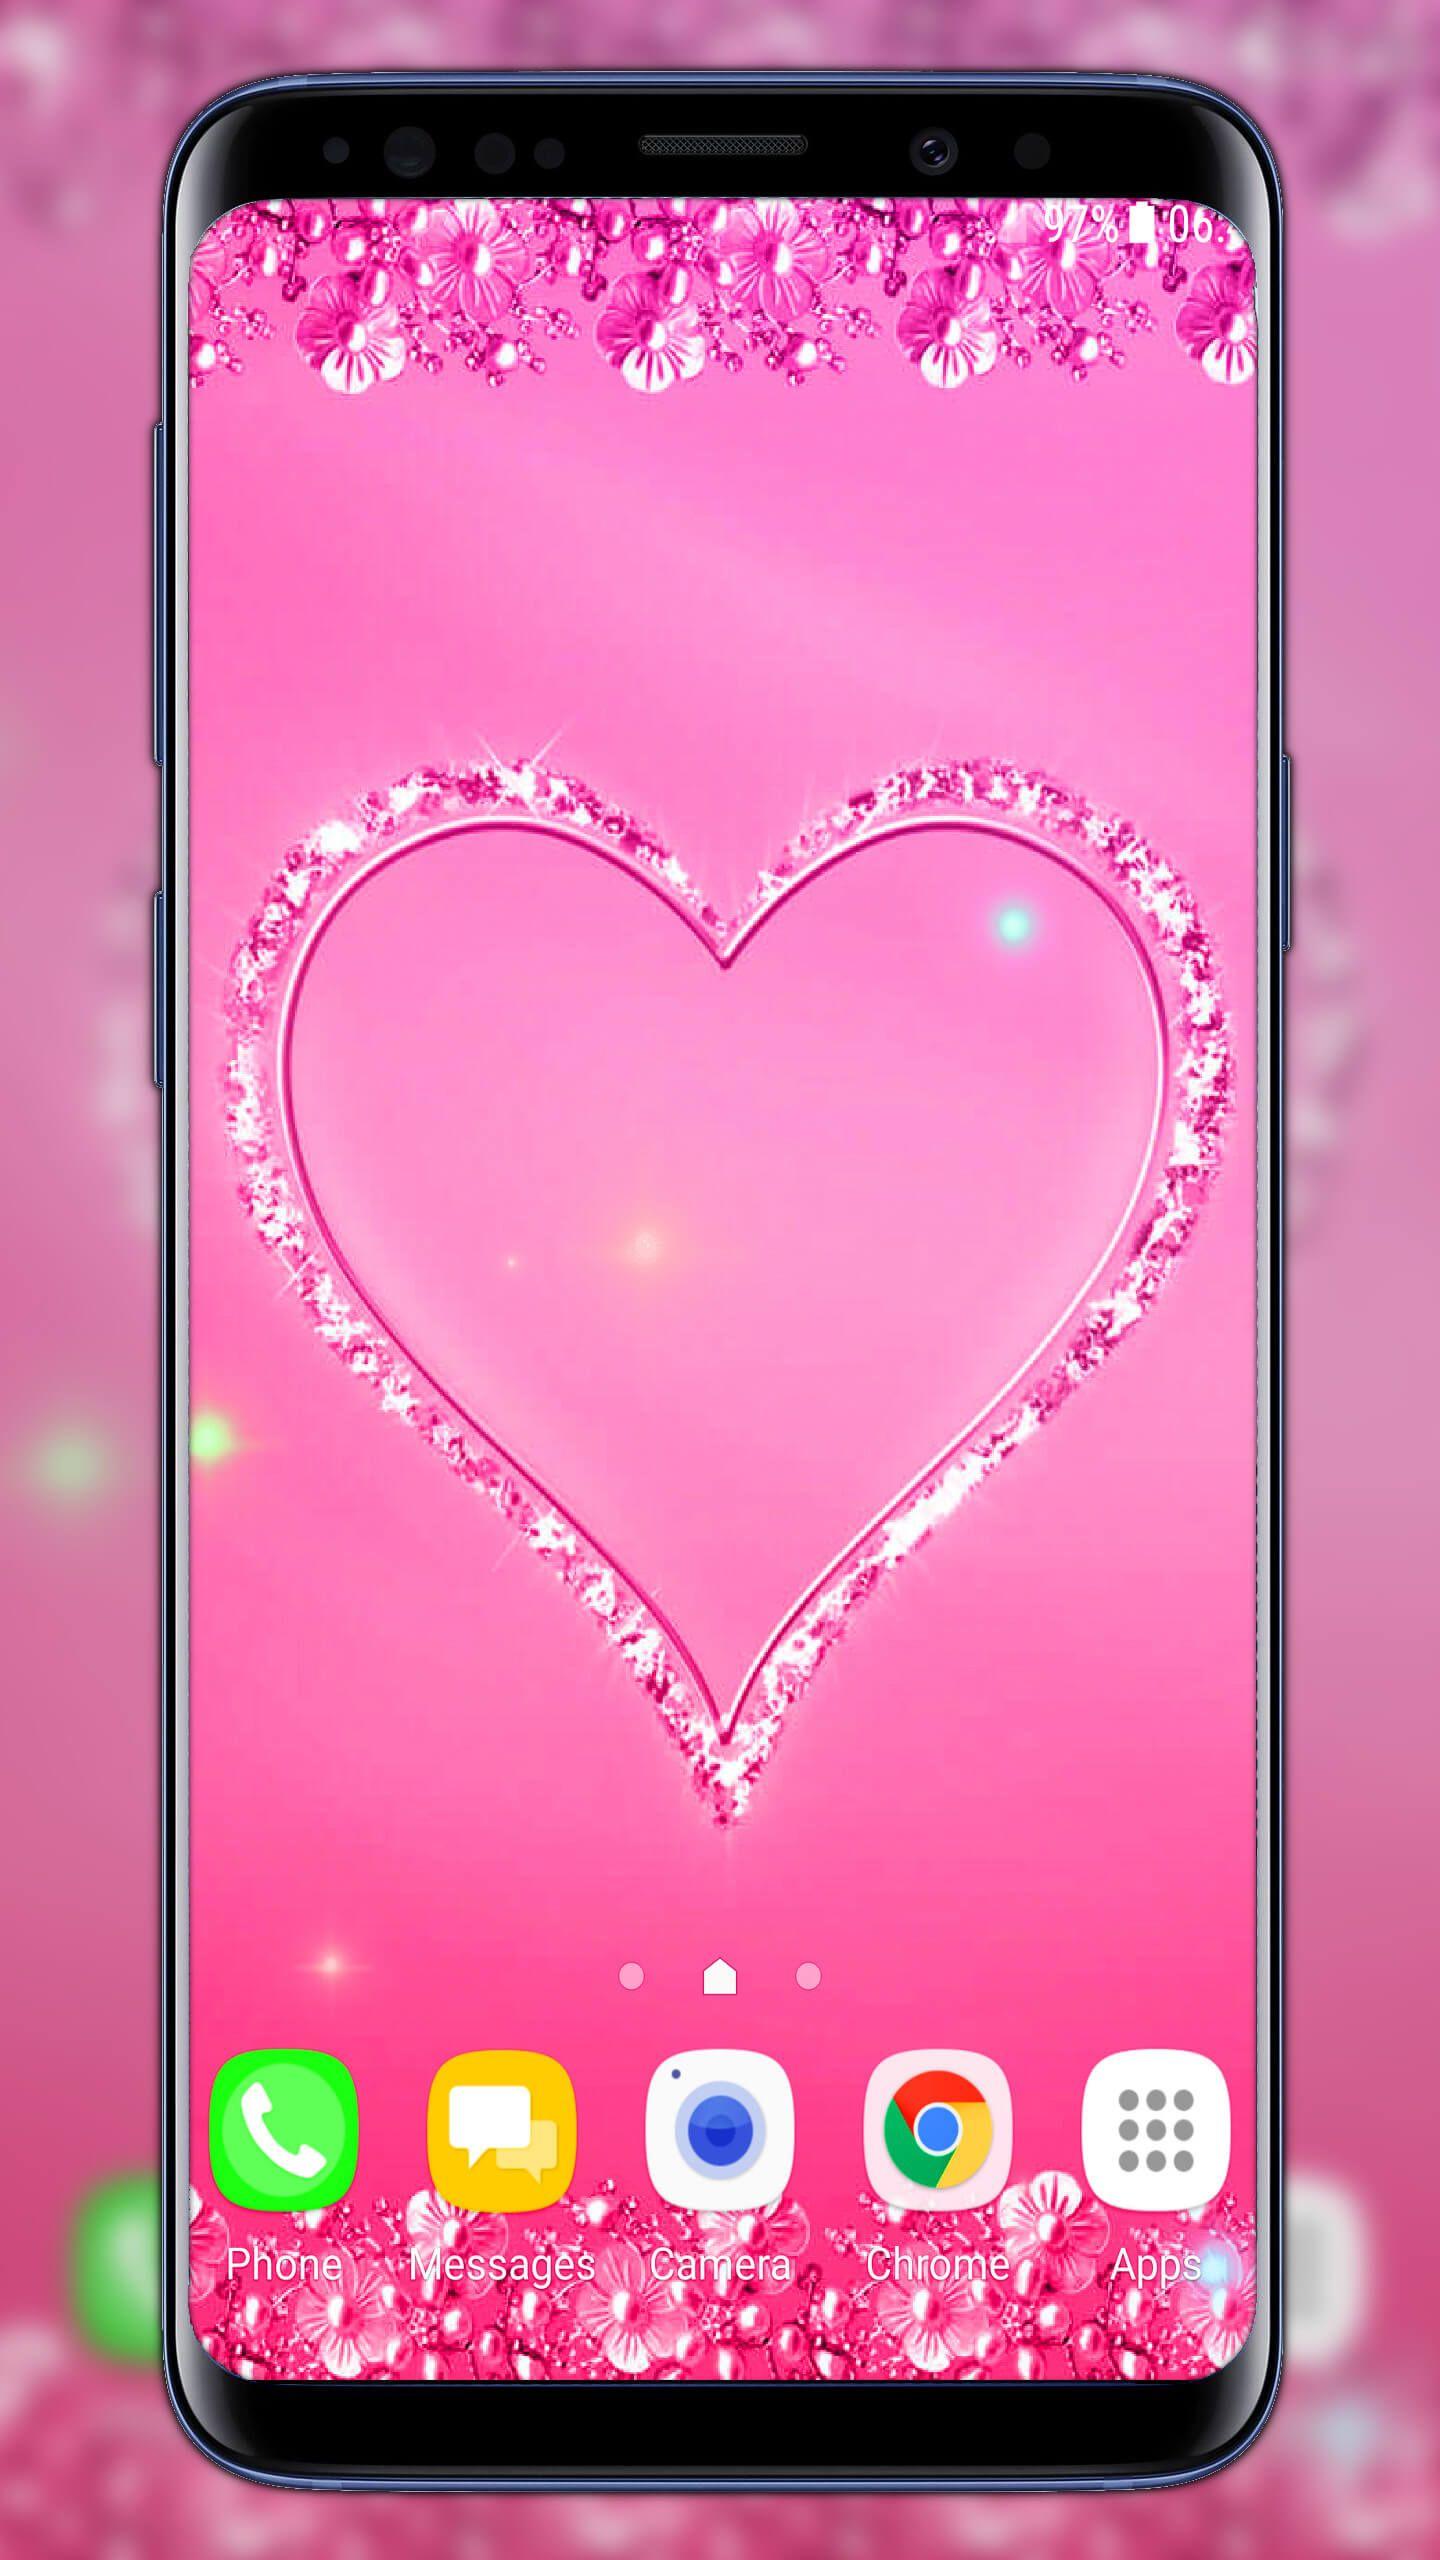 Pink Live Wallpaper Pink Cute Wallpaper Live Wallpapers Pink Live Wallpaper